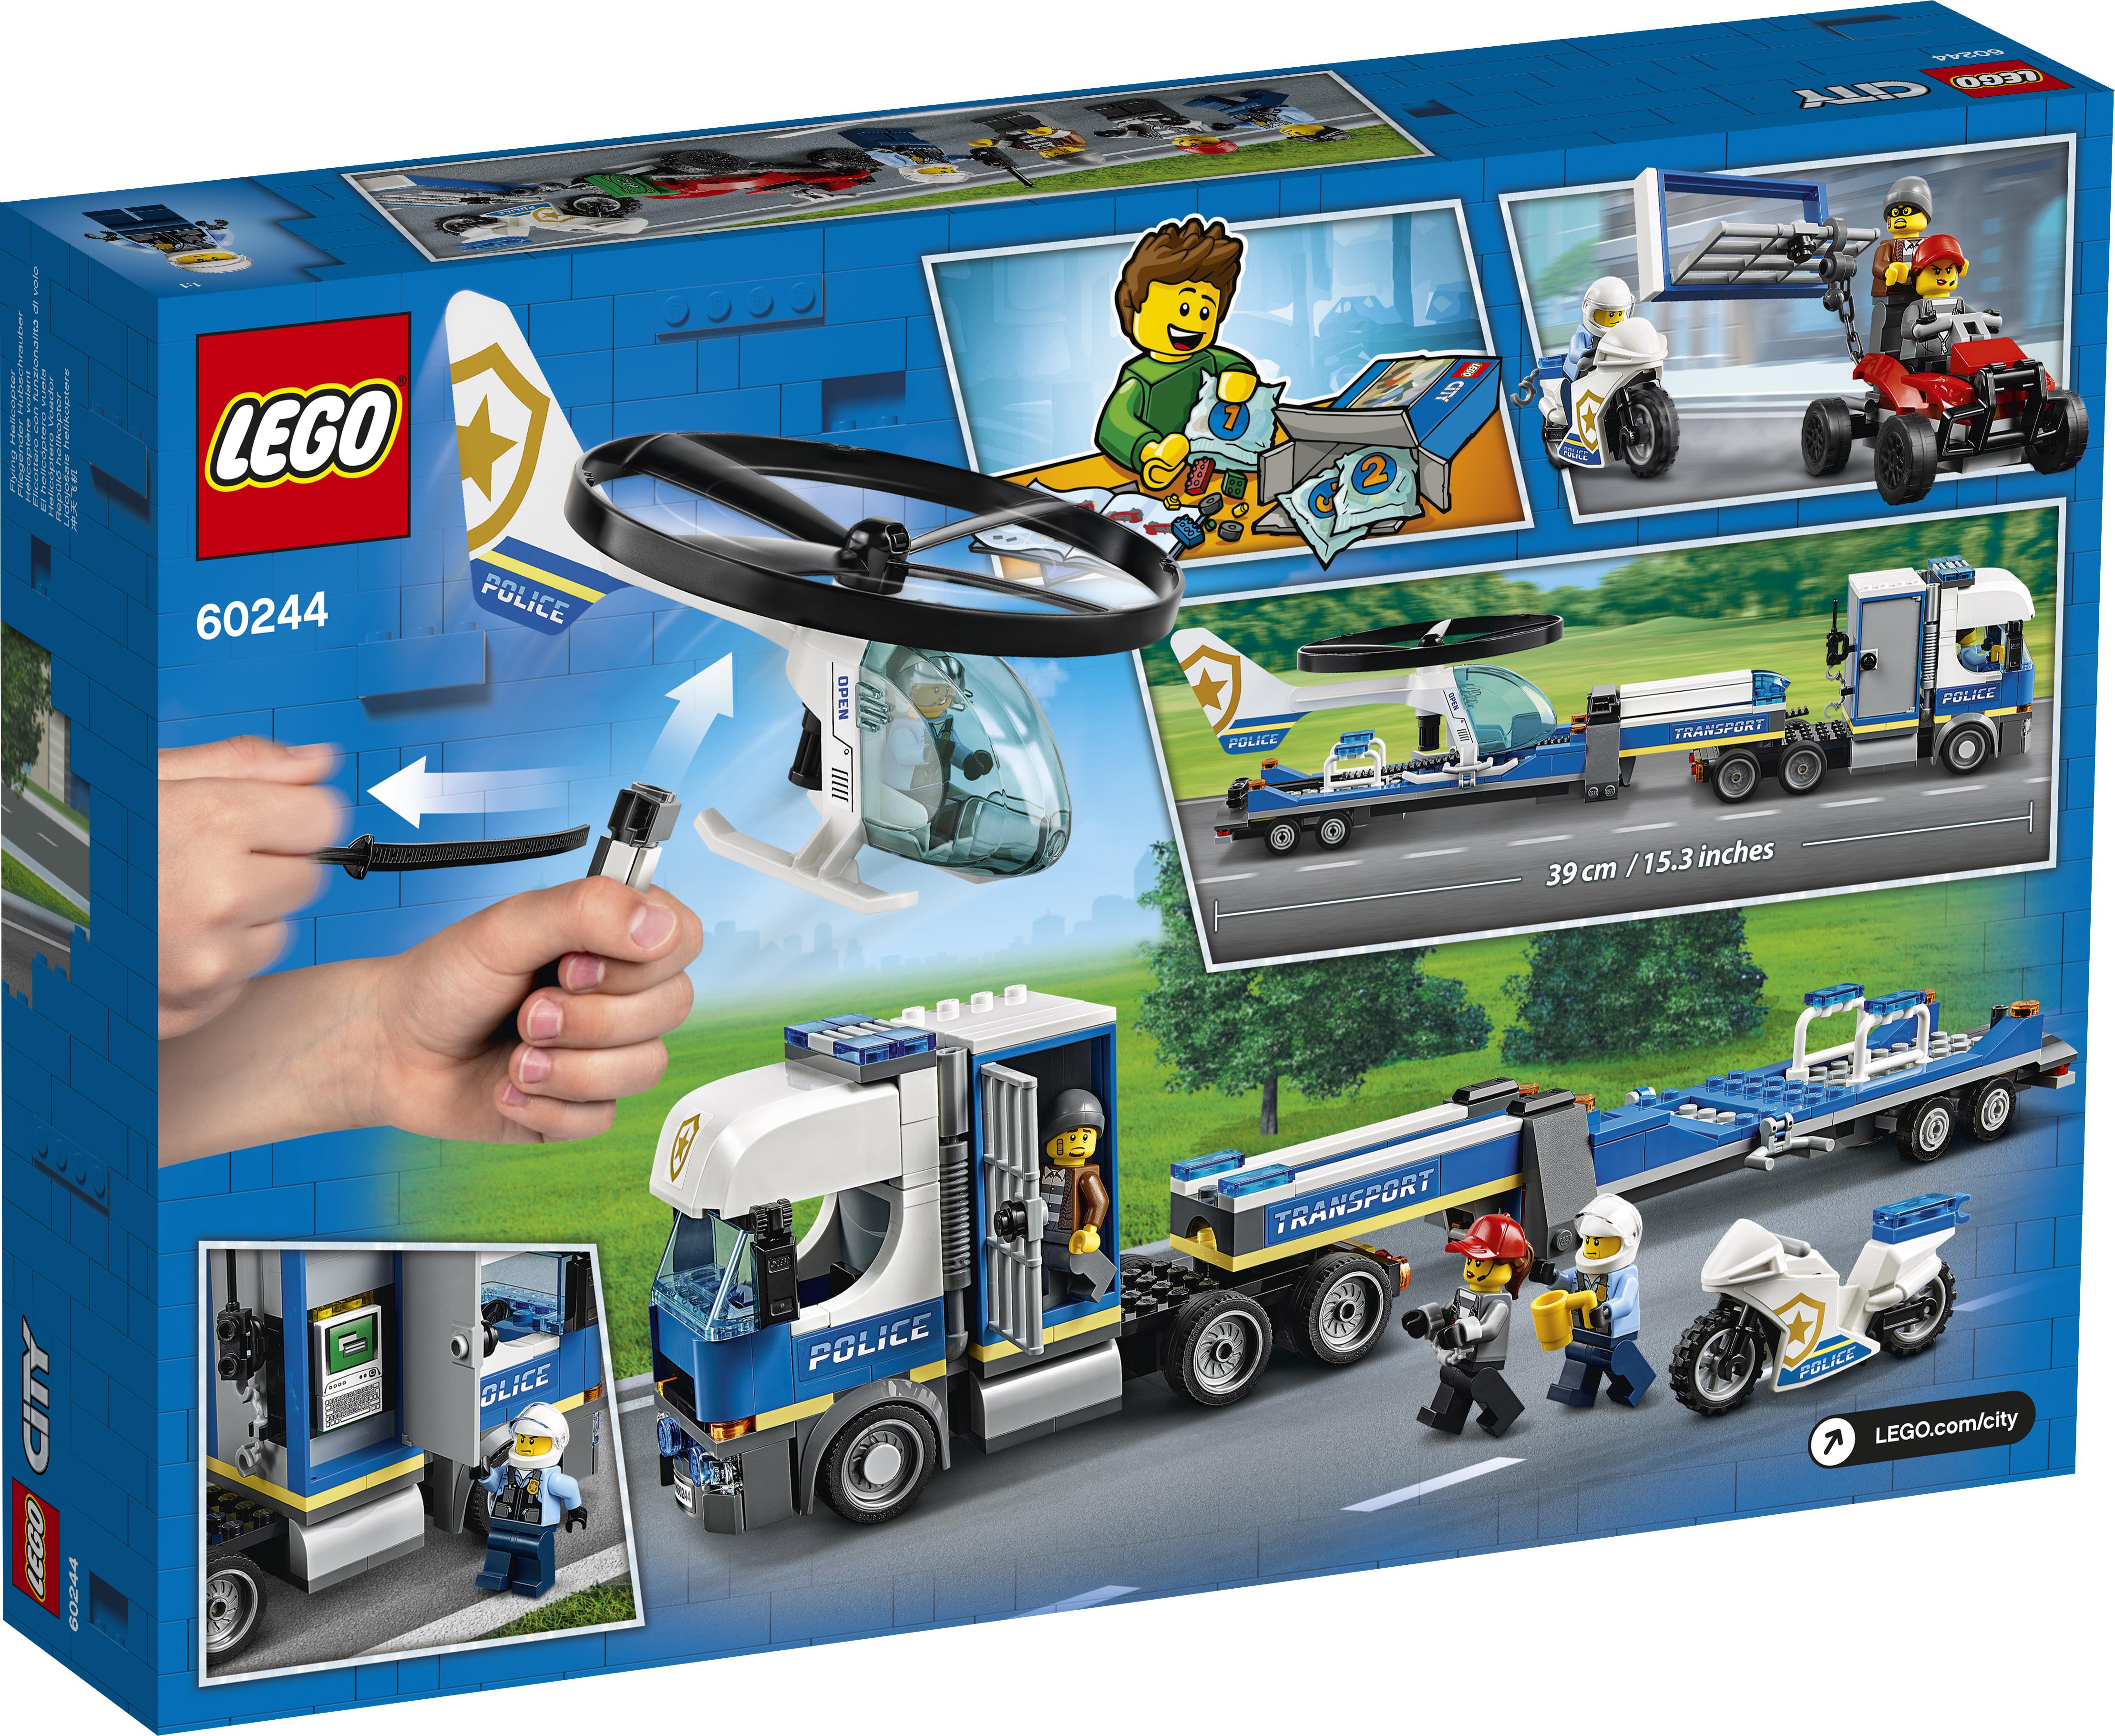 LEGO City Politihelikoptertransport - 60244